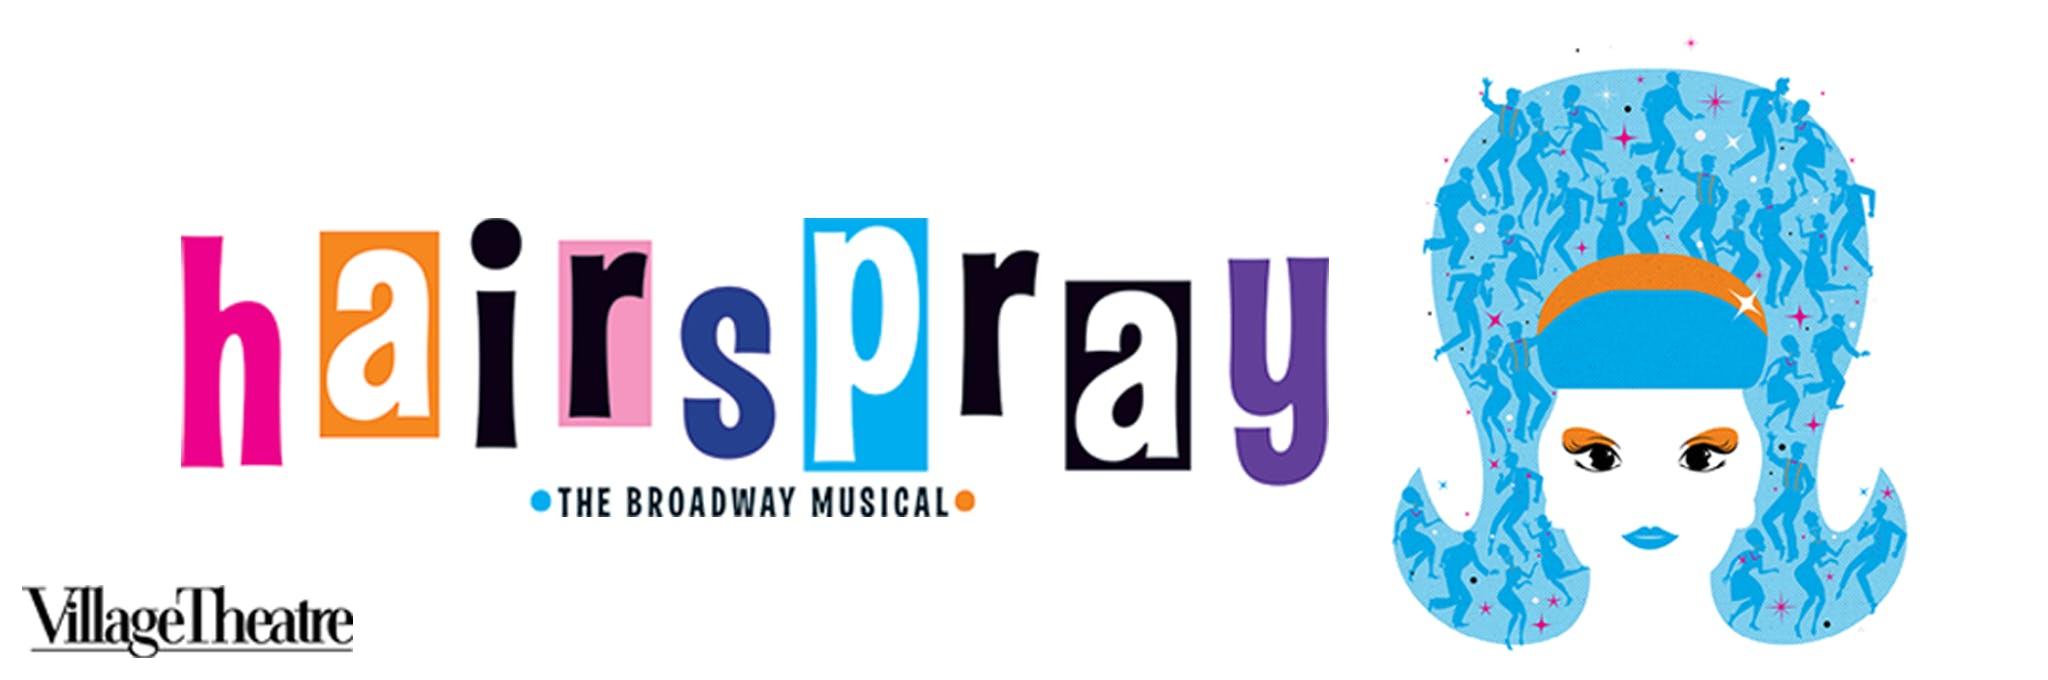 Hairspray - Issaquah Logo